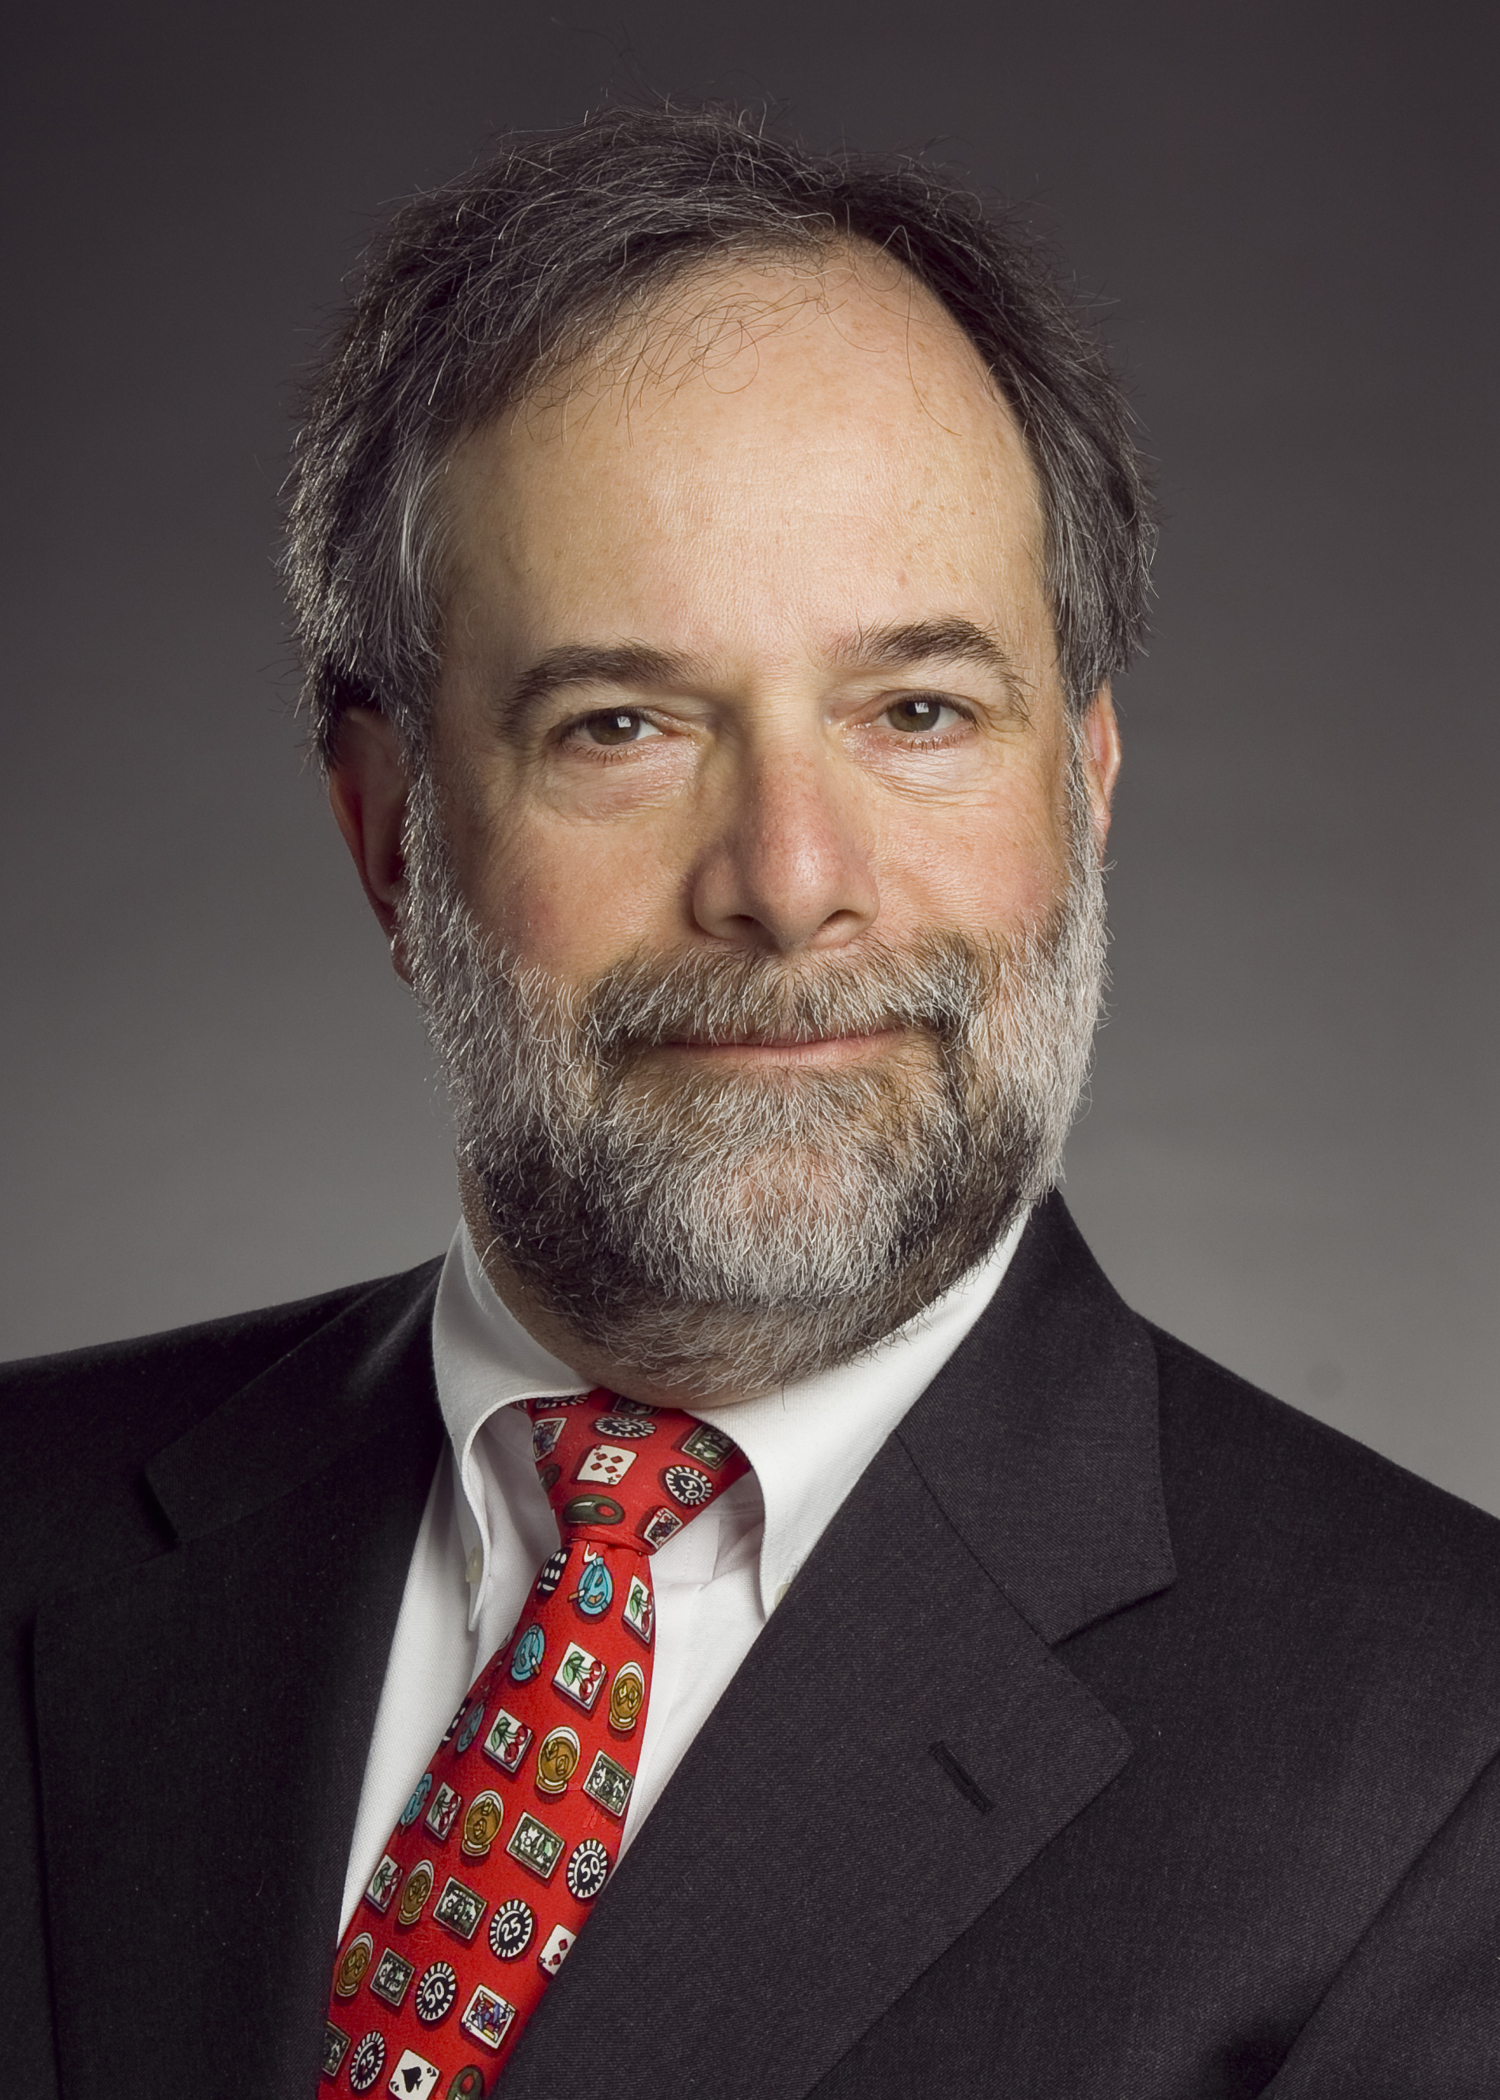 Dr. John Tydings, orthopedic spine surgeon from Central Jersey Spine Associates